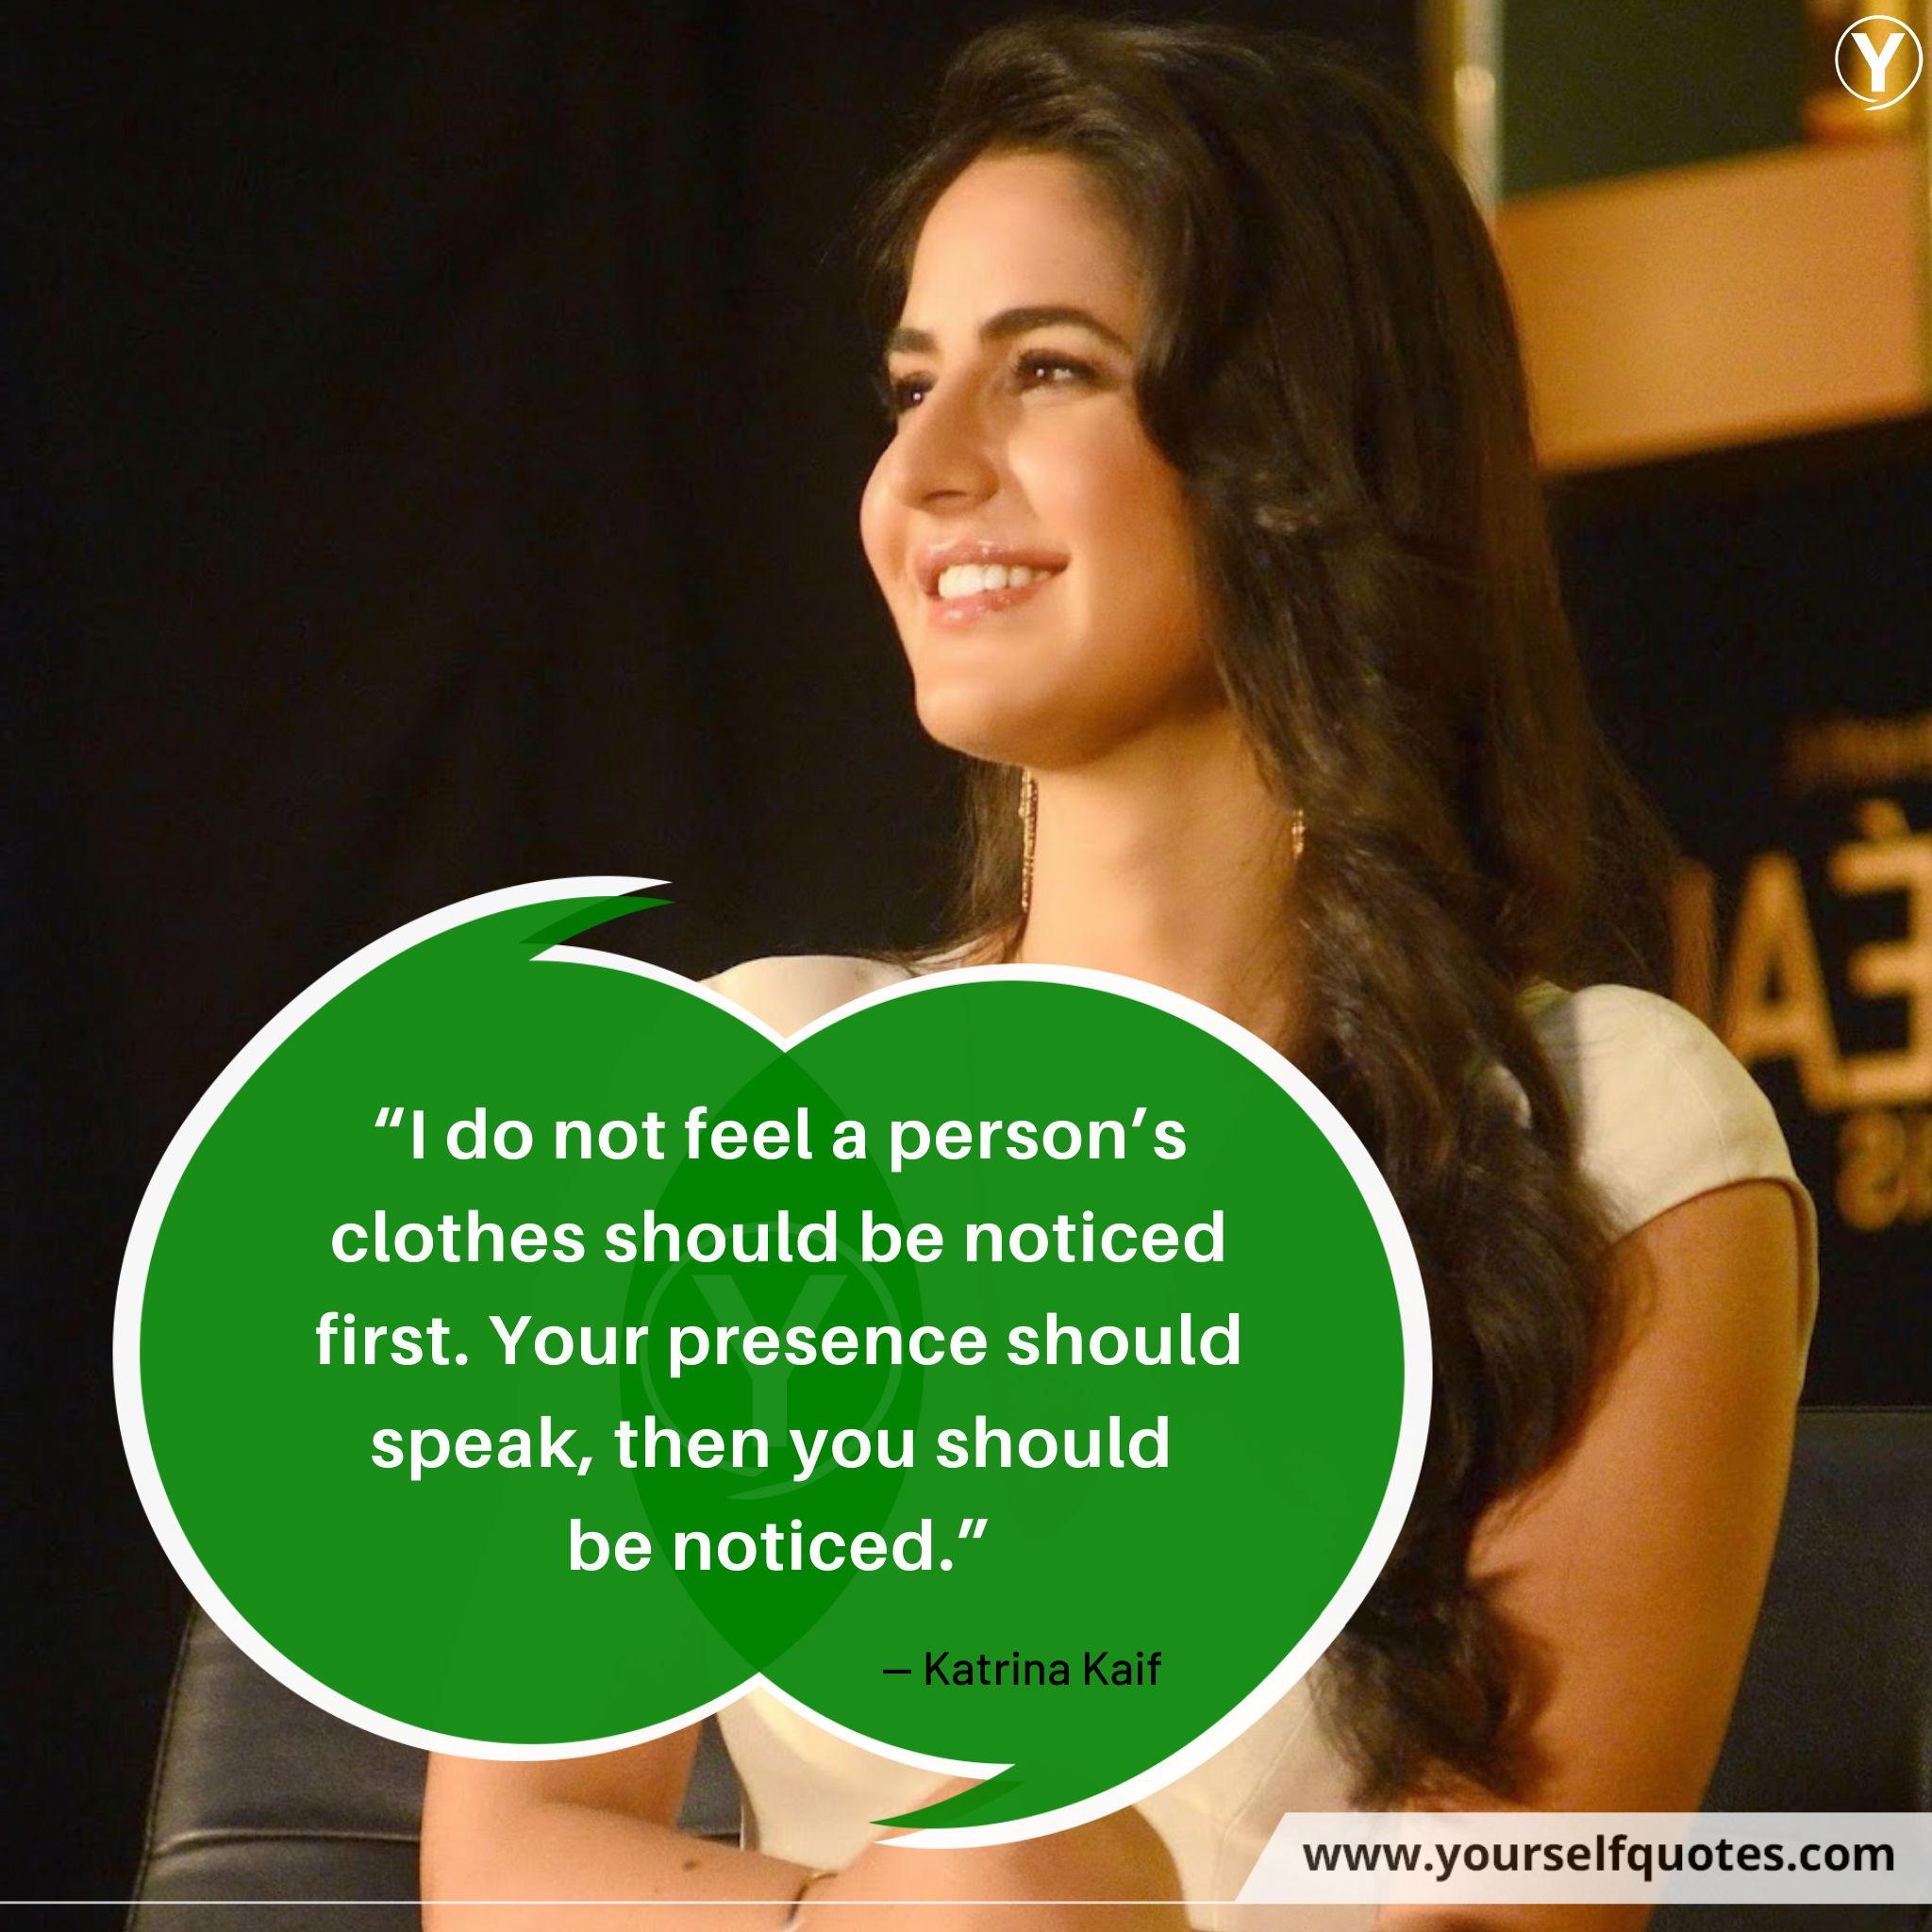 Famous Quote from Katrina Kaif